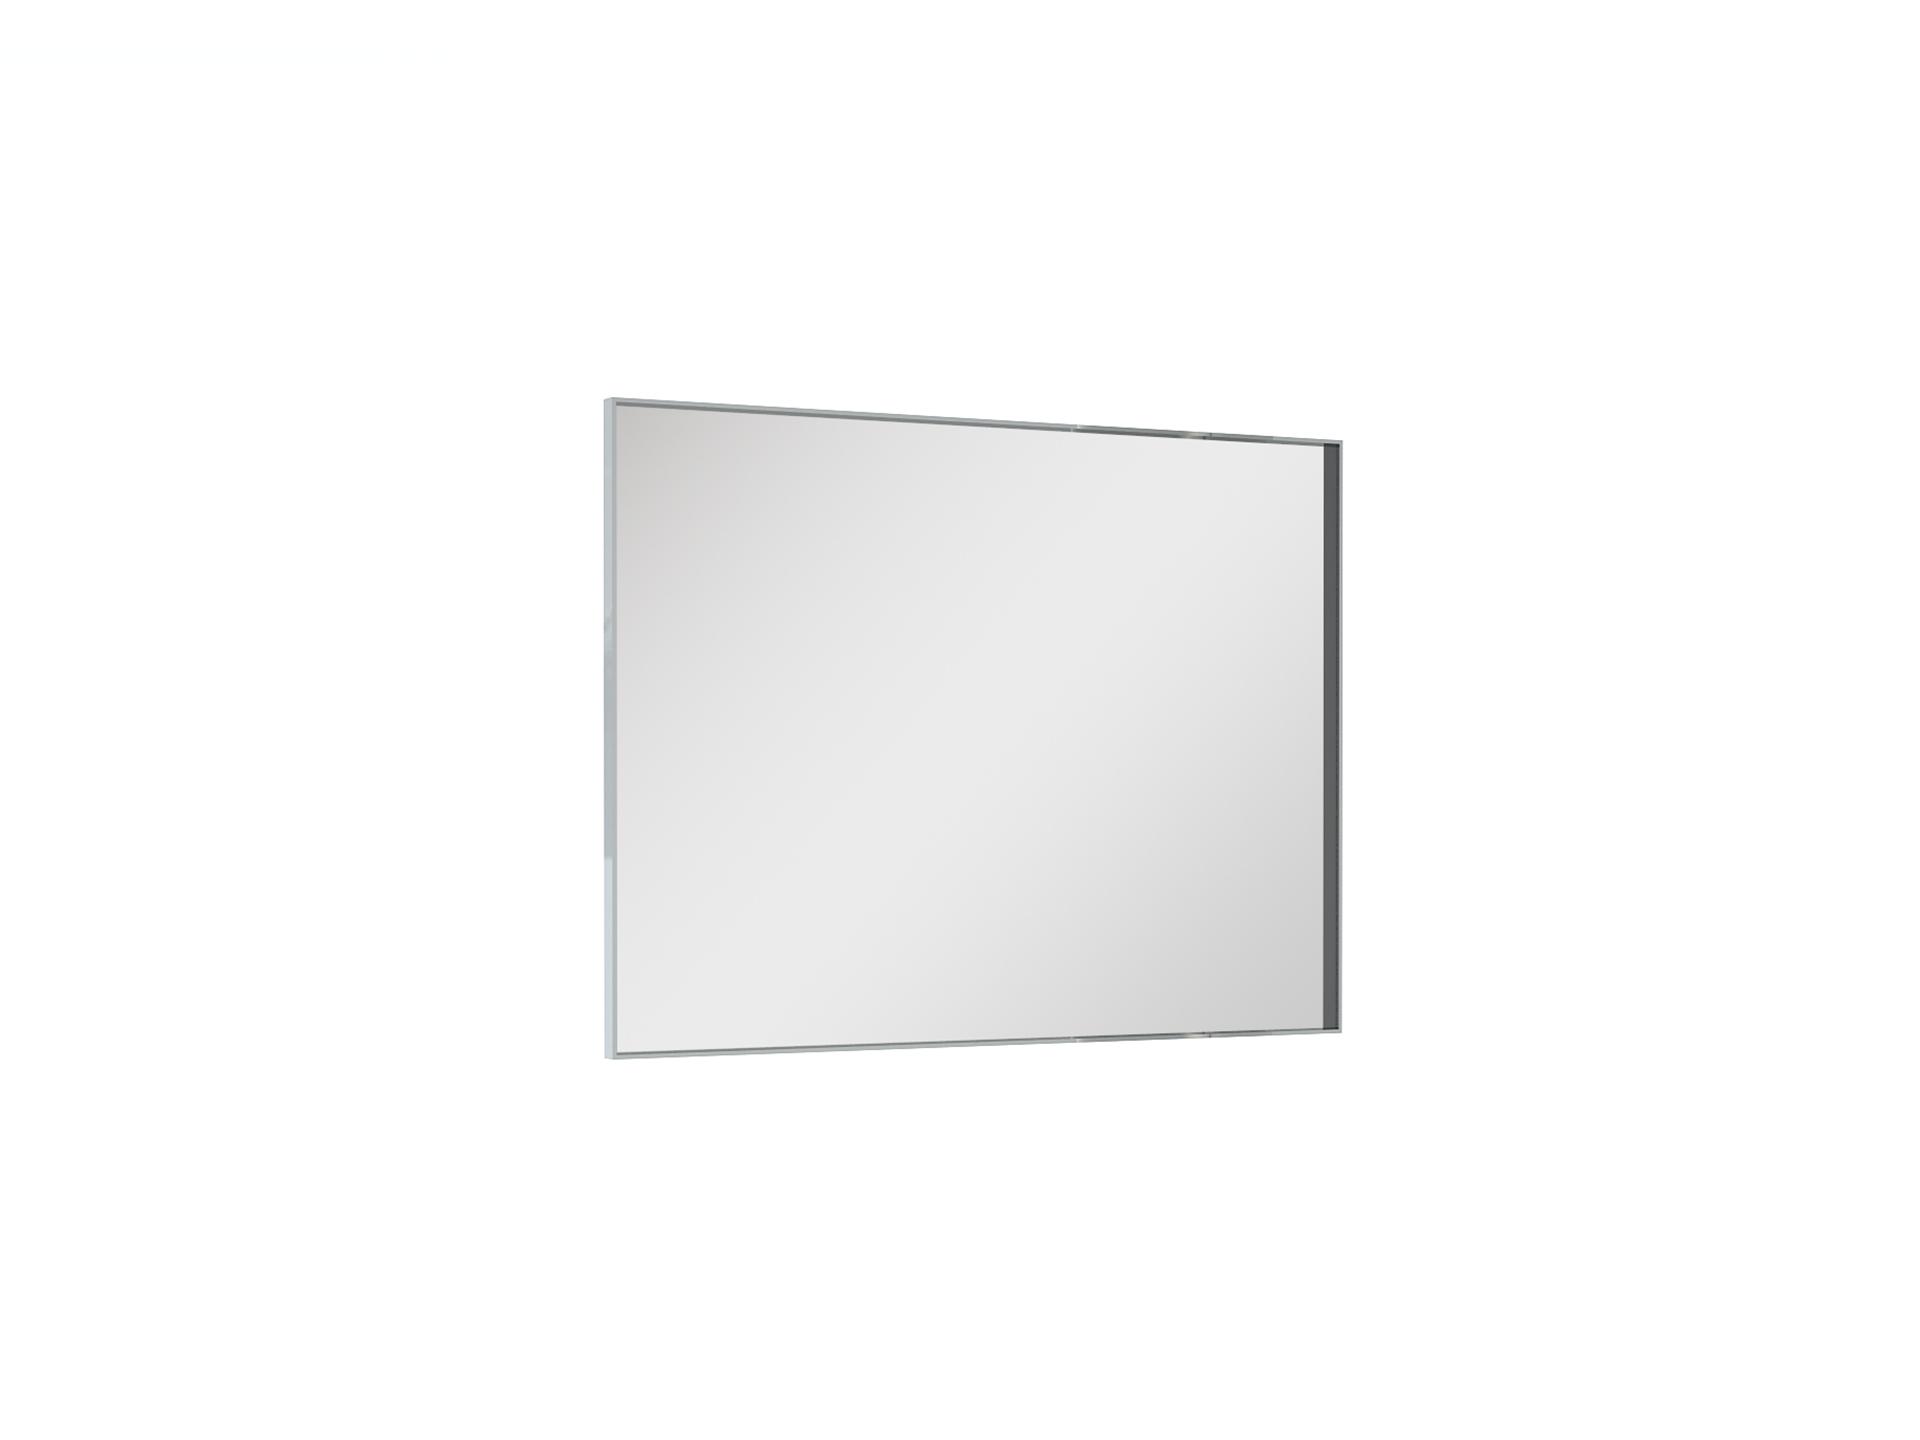 Badkamer Spiegelkast Rood : Lafiness element spiegel 80x60 cm aluminium hubo